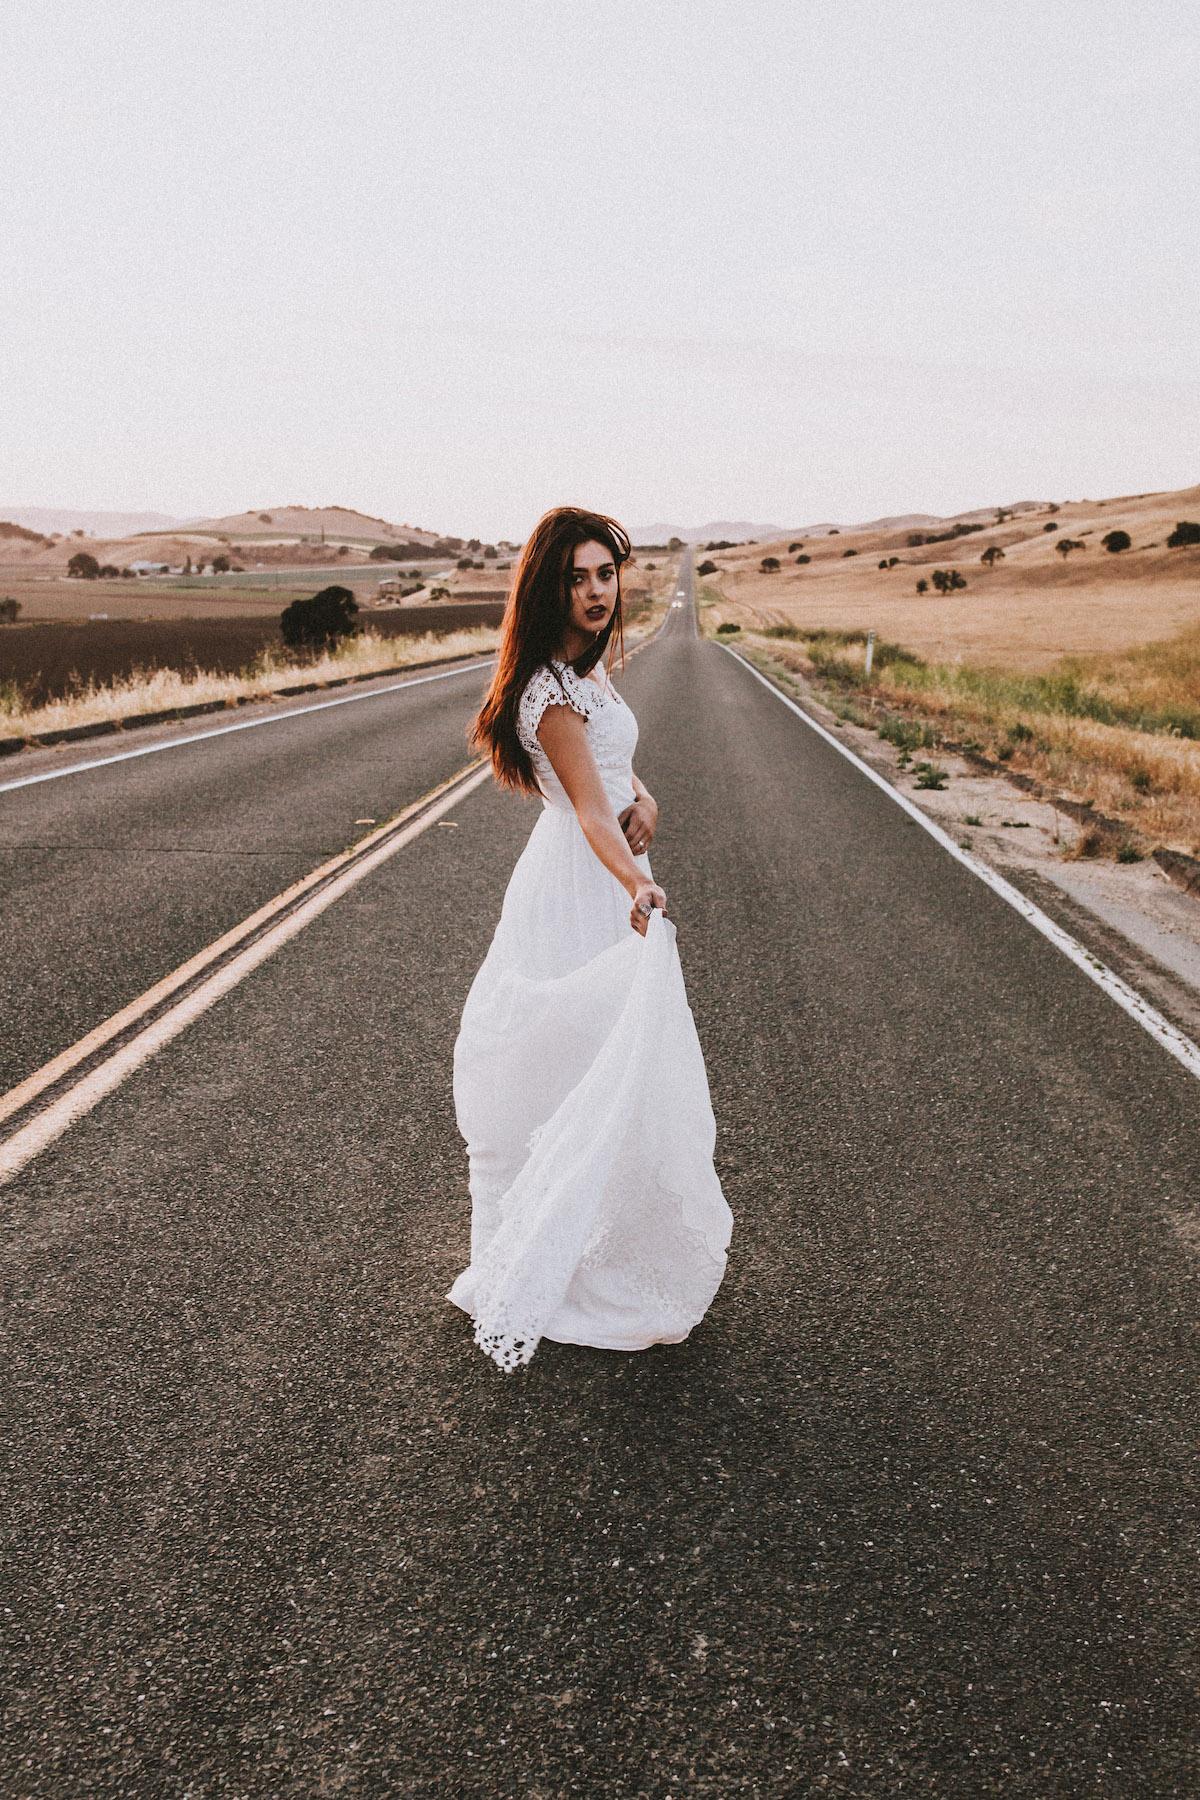 daisy-silk-wedding-dress-for-the-boho-bride